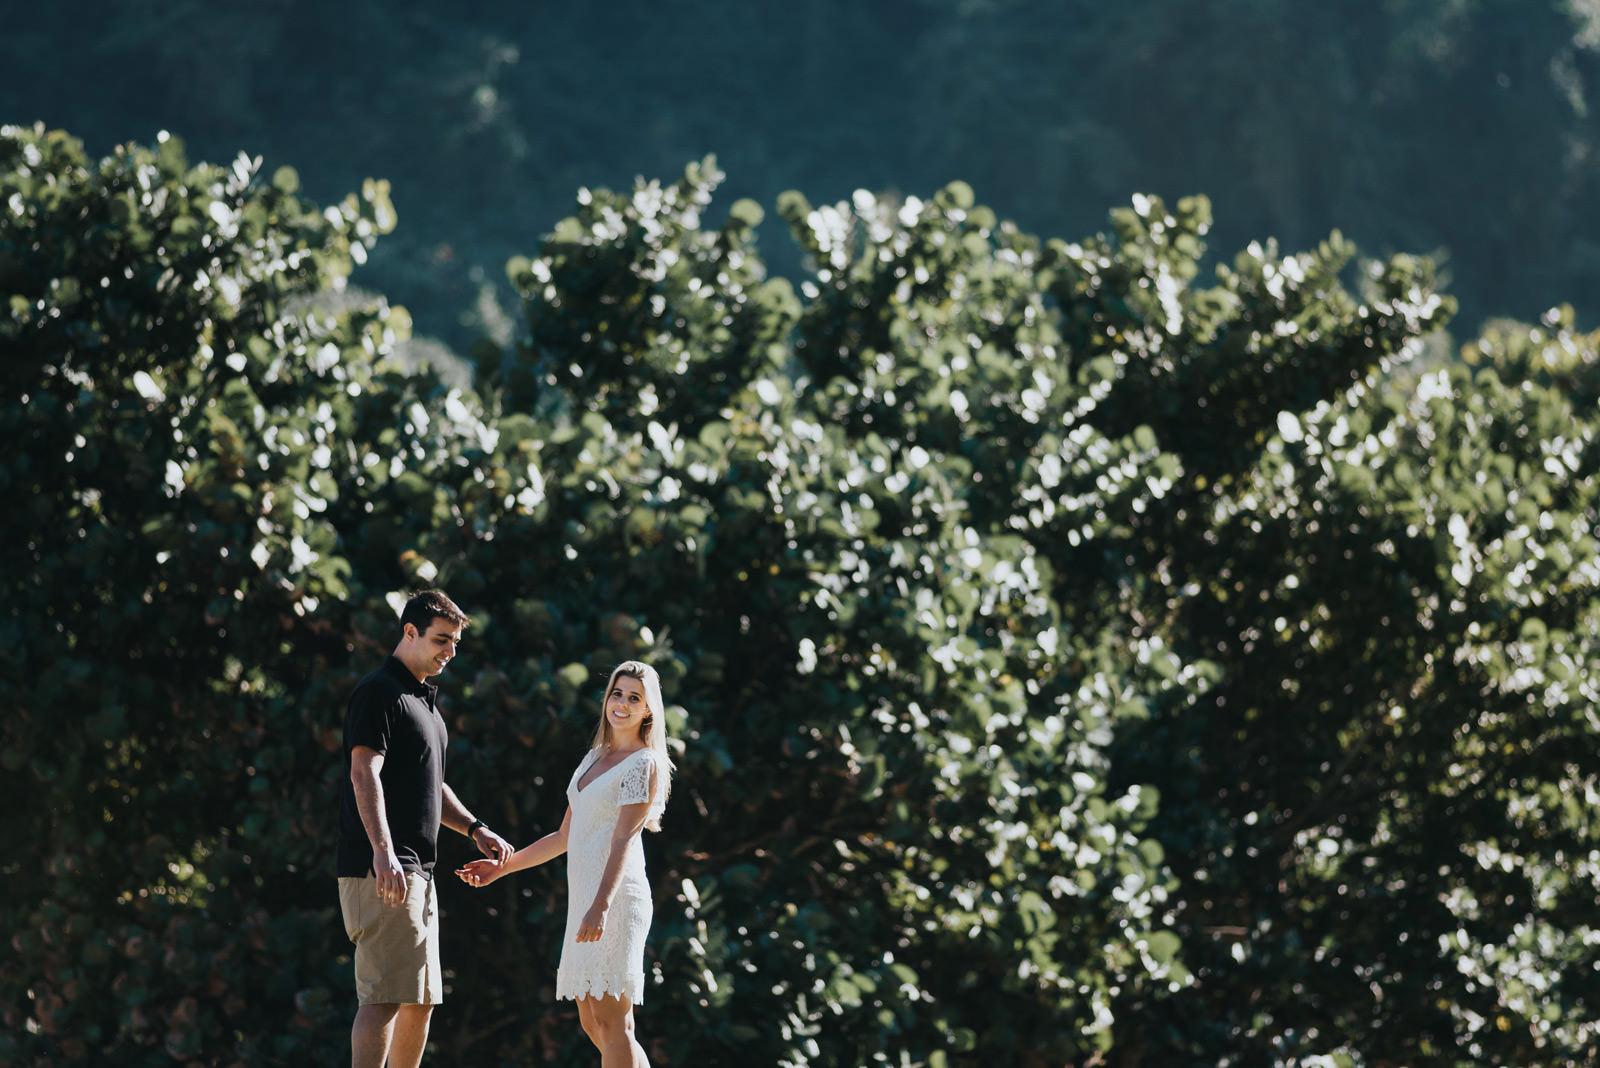 Ensaio pre wedding rj